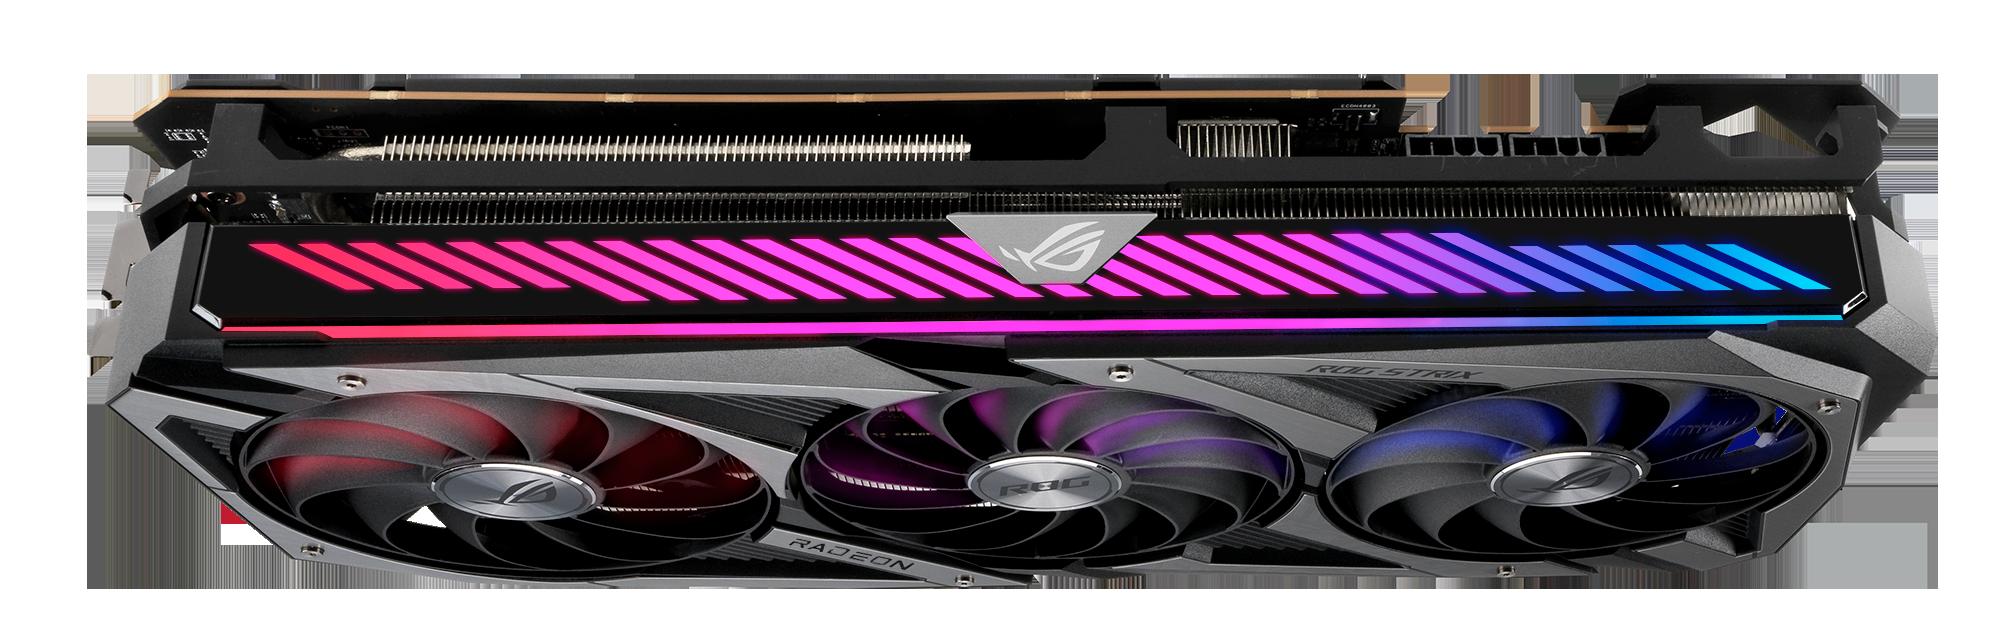 ROG-Strix-Radeon-RX-6800_22